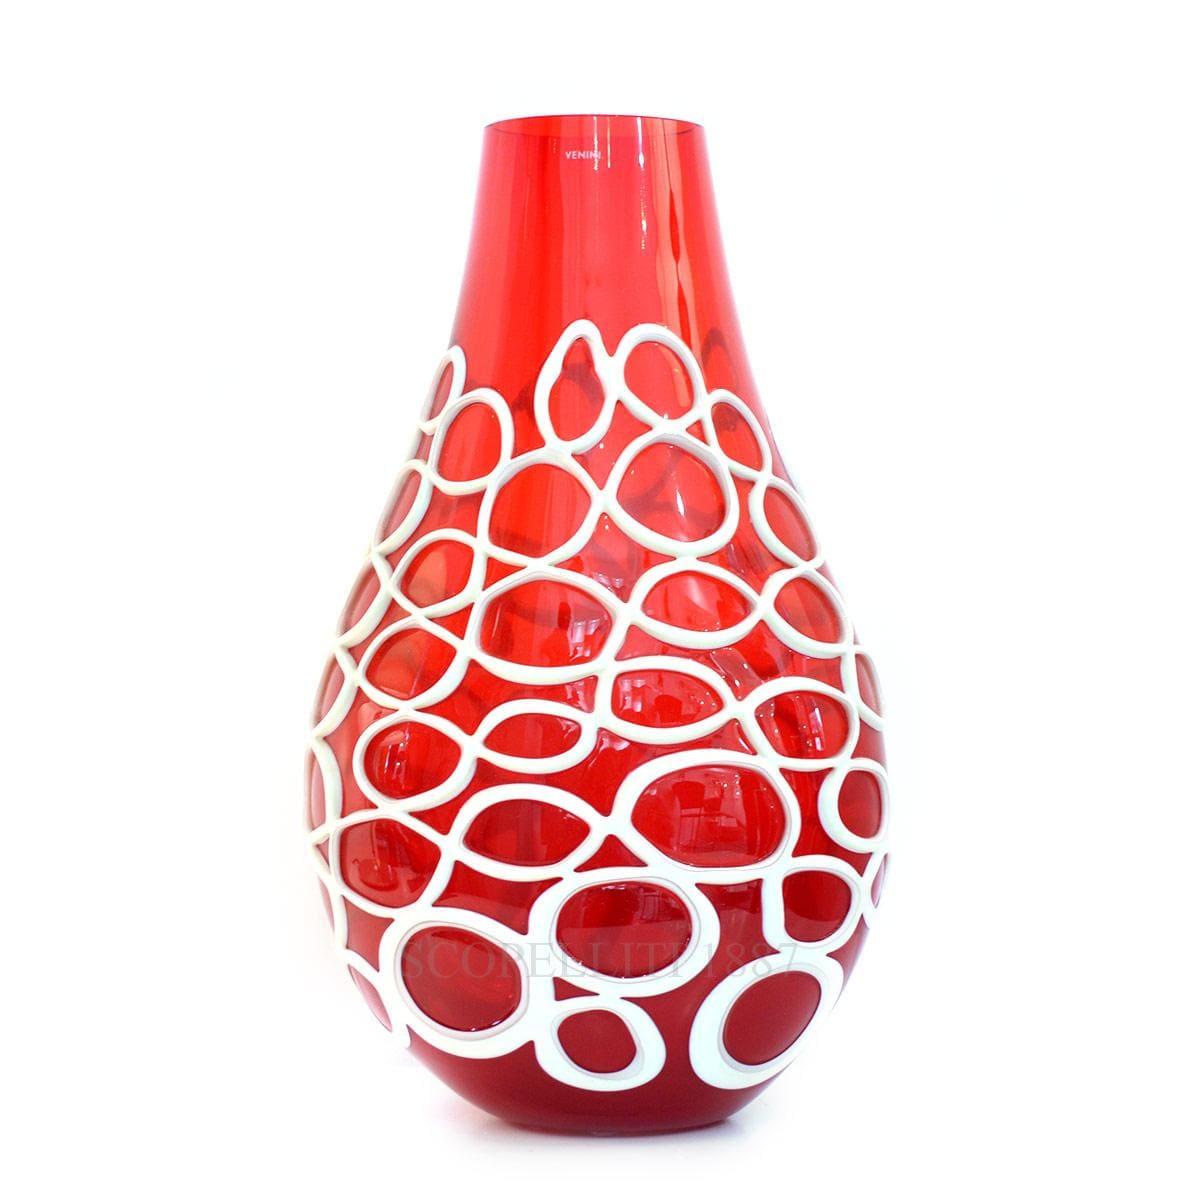 vaso rosso vaso kyklos rosso venini scopelliti 1887